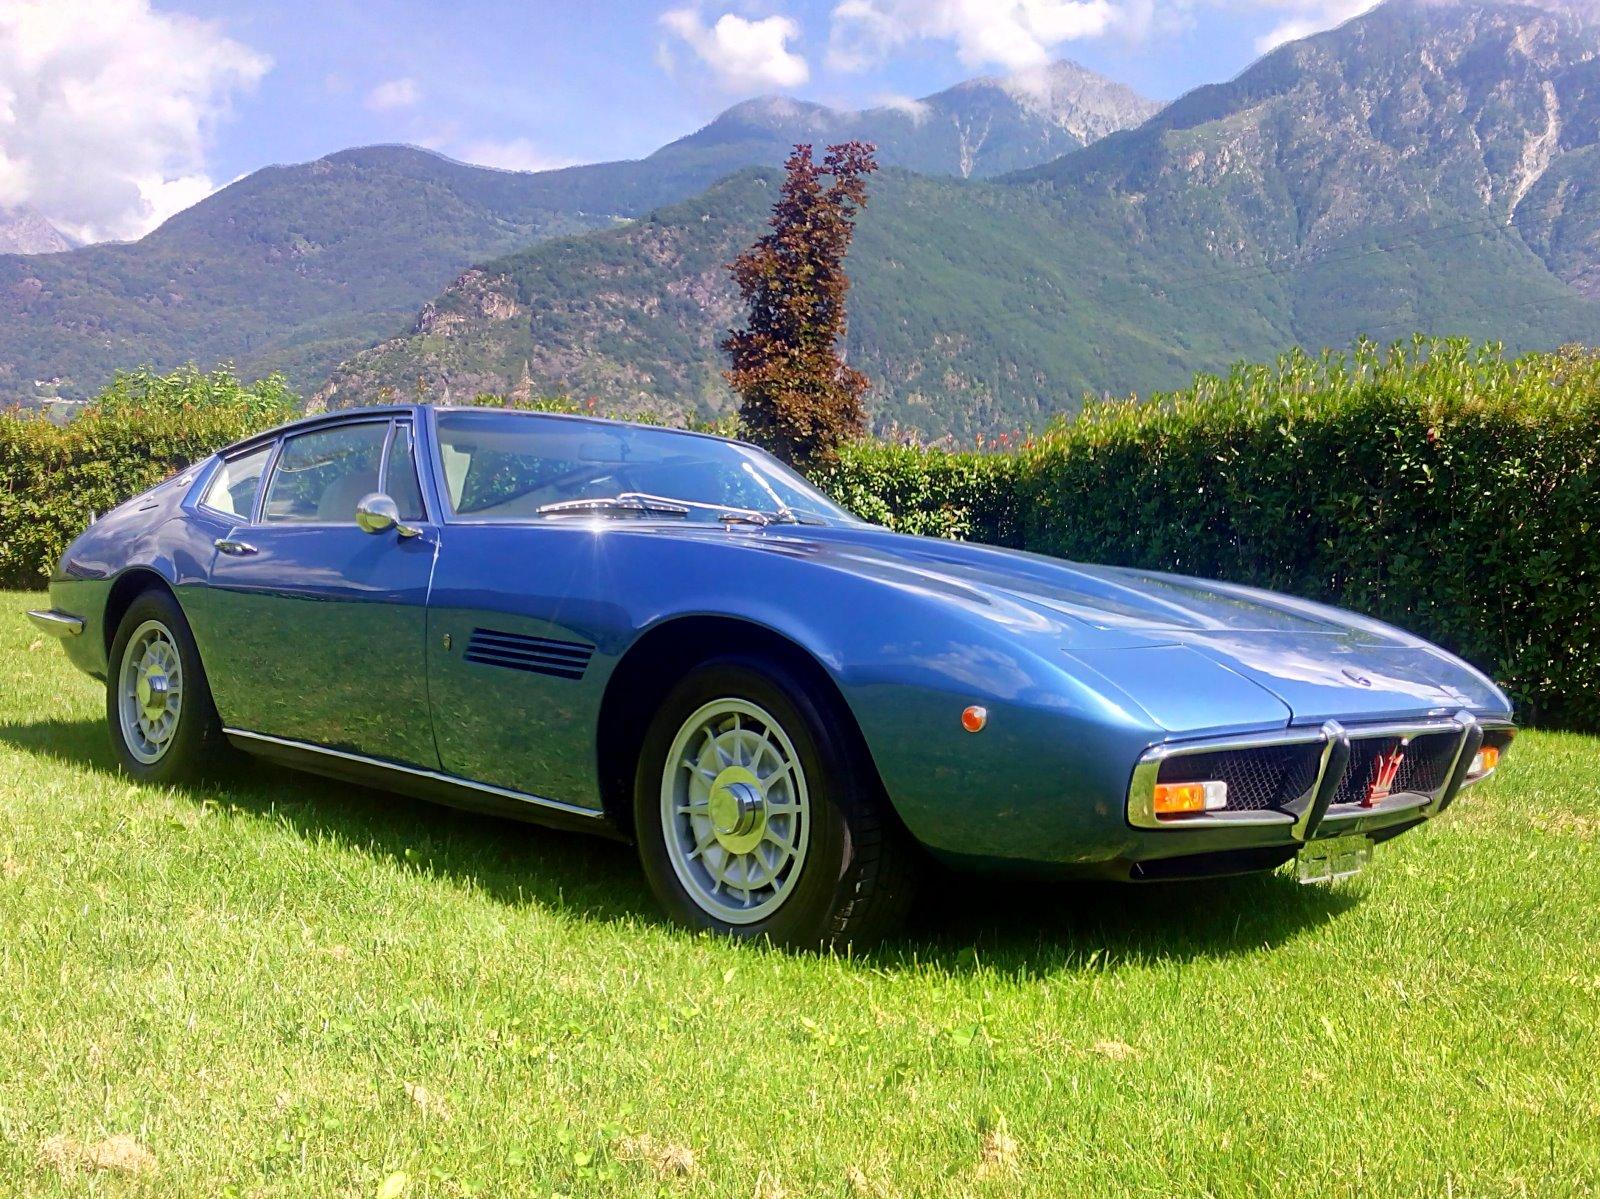 1972 Maserati Ghibli - 4.9 SS - ONE OF 366 | Classic ...